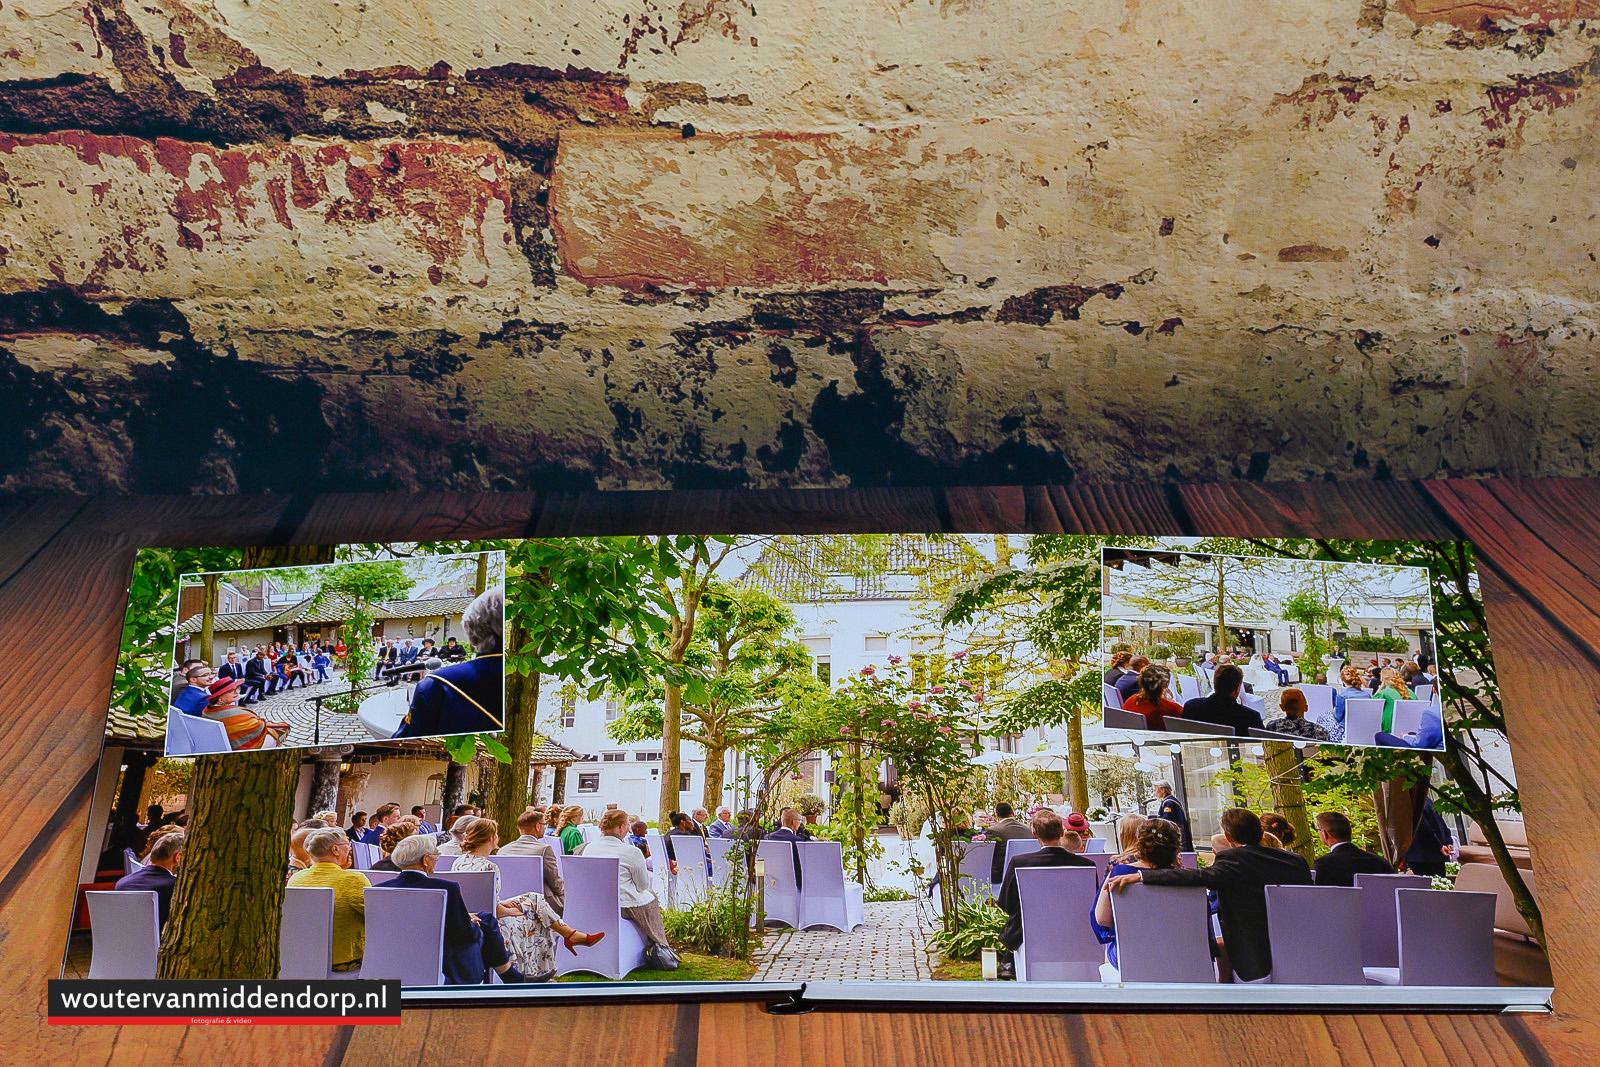 trouwalbum, bruidsreportage, trouwfotograaf, groepsfoto, fotograaf, Wouter van Middendorp, Veluwe, Uddel, Lunteren, (4)